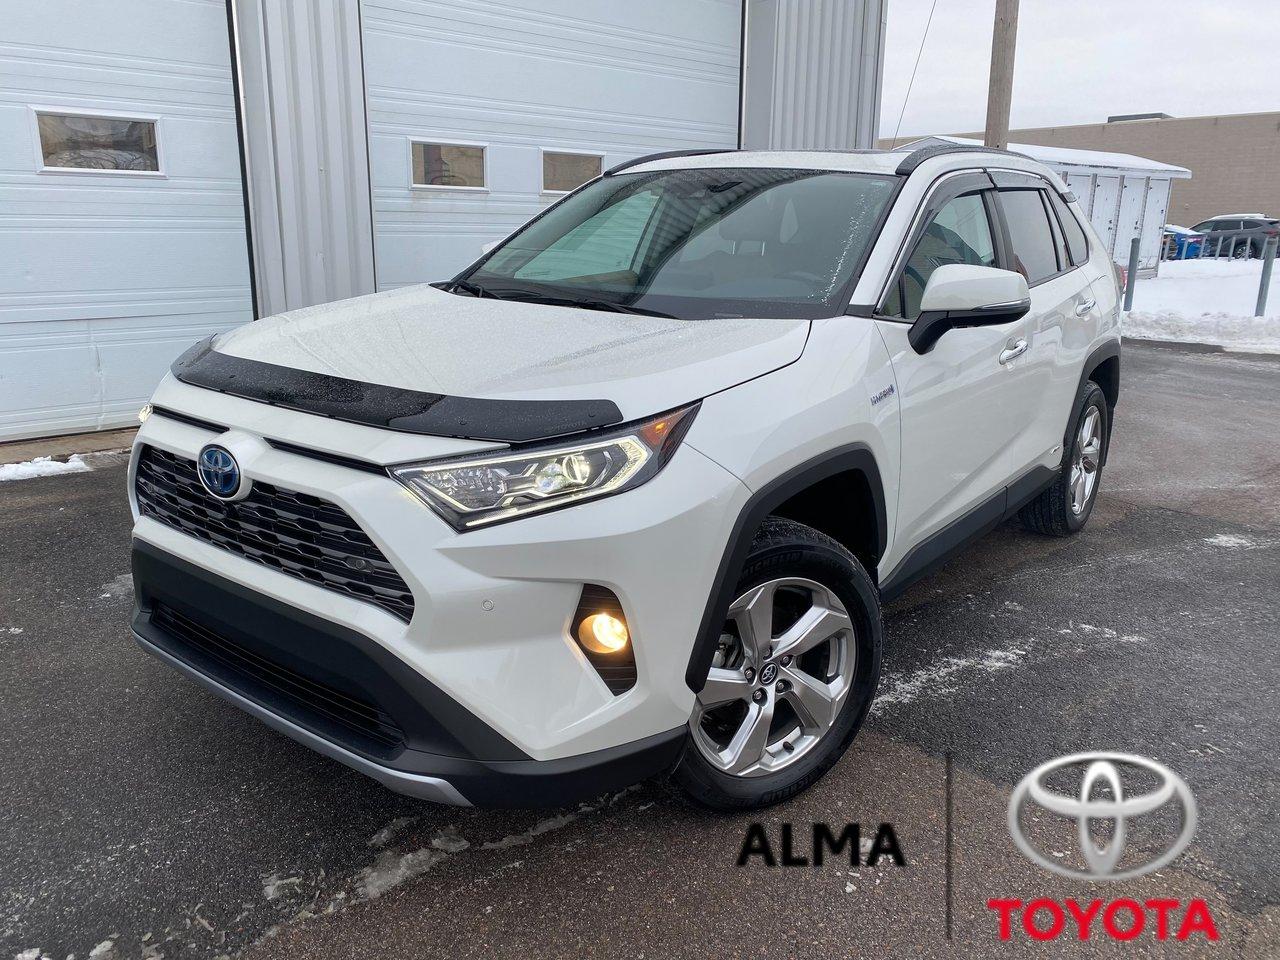 2019 Toyota  RAV4 LIMITED HYBRID, AWD, TRÈS RARE SUR LE MARCHÉ,